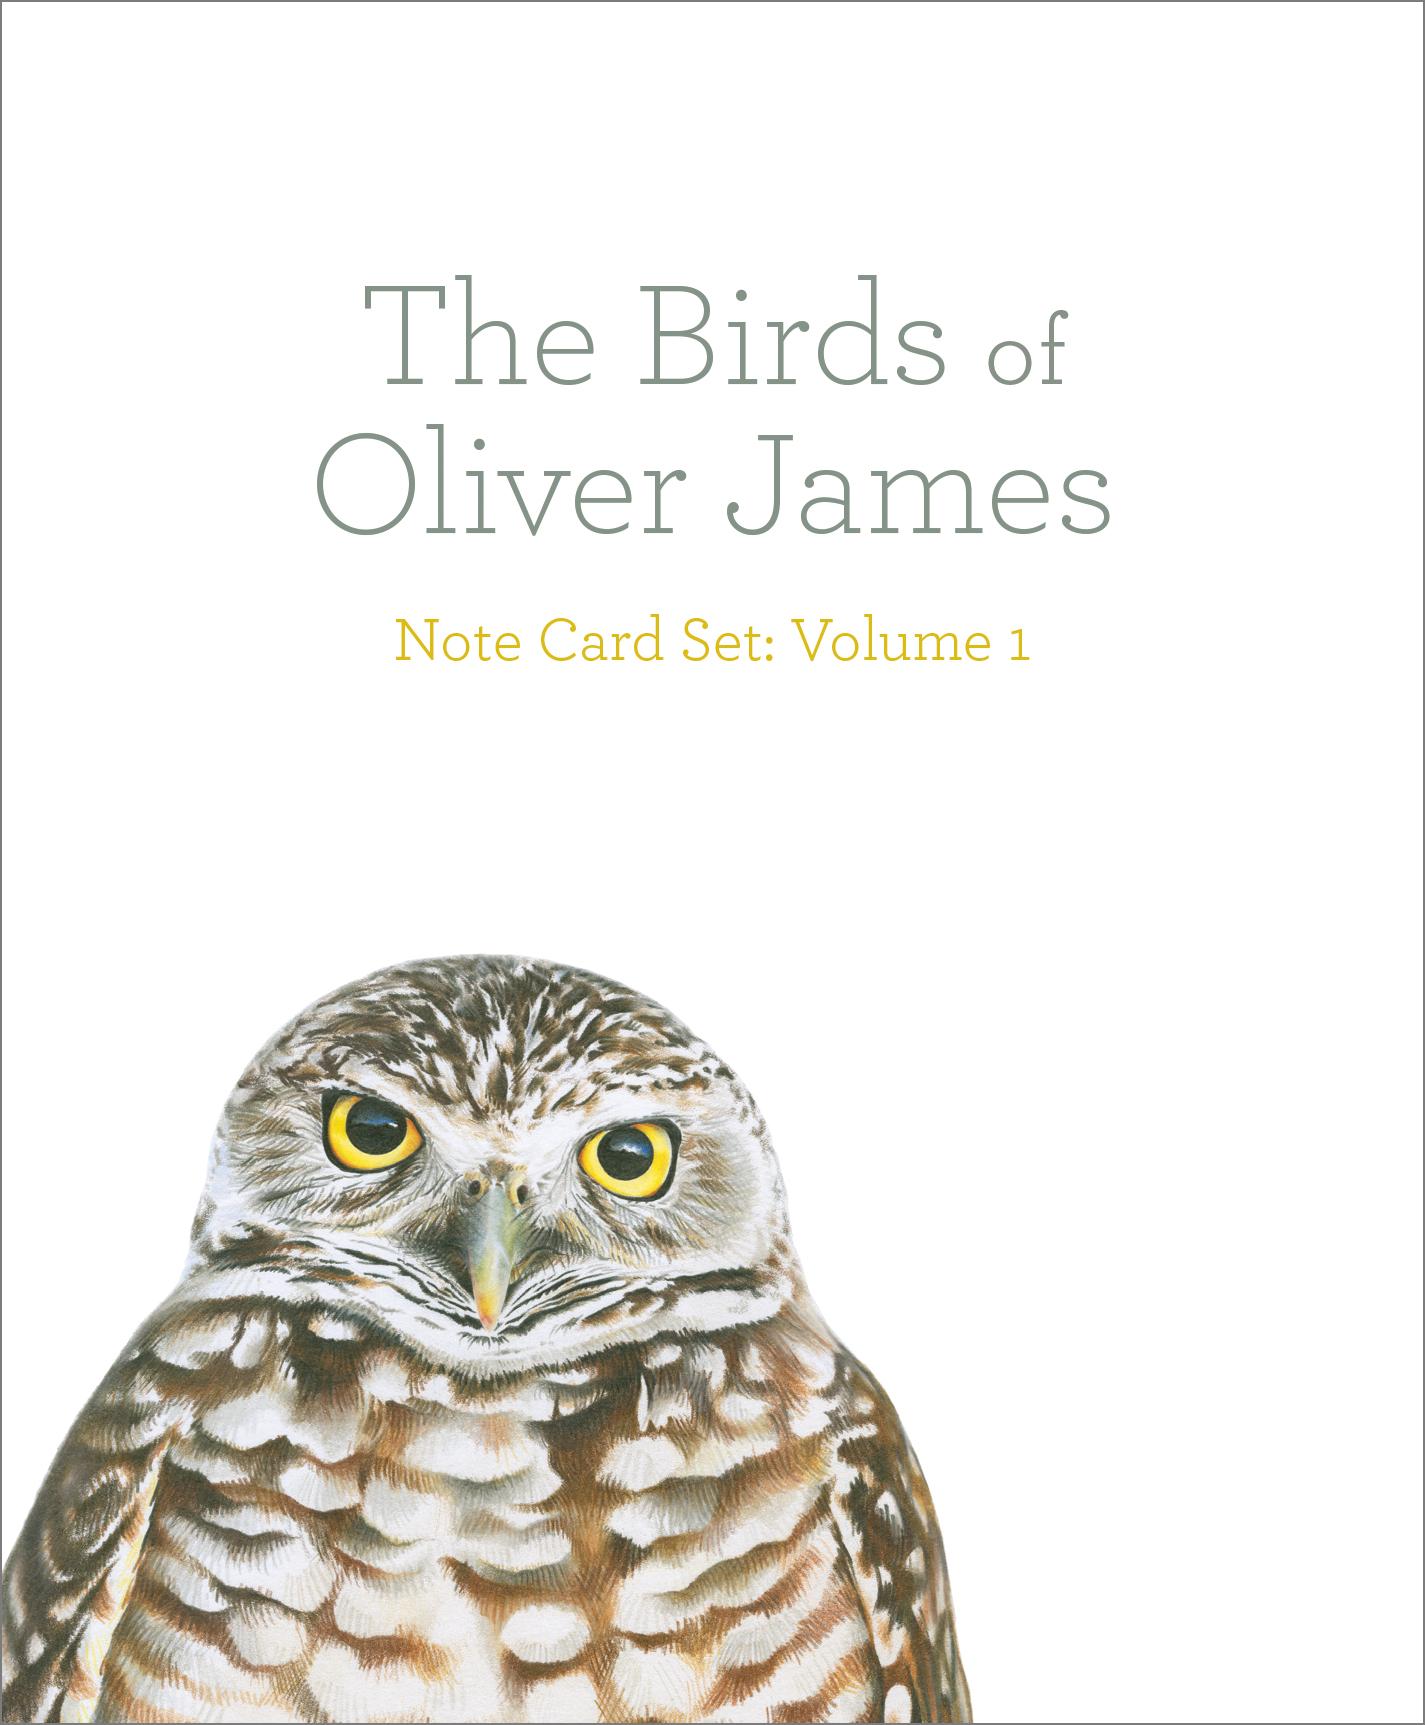 The Birds of Oliver James Note Card Set: Volume 1